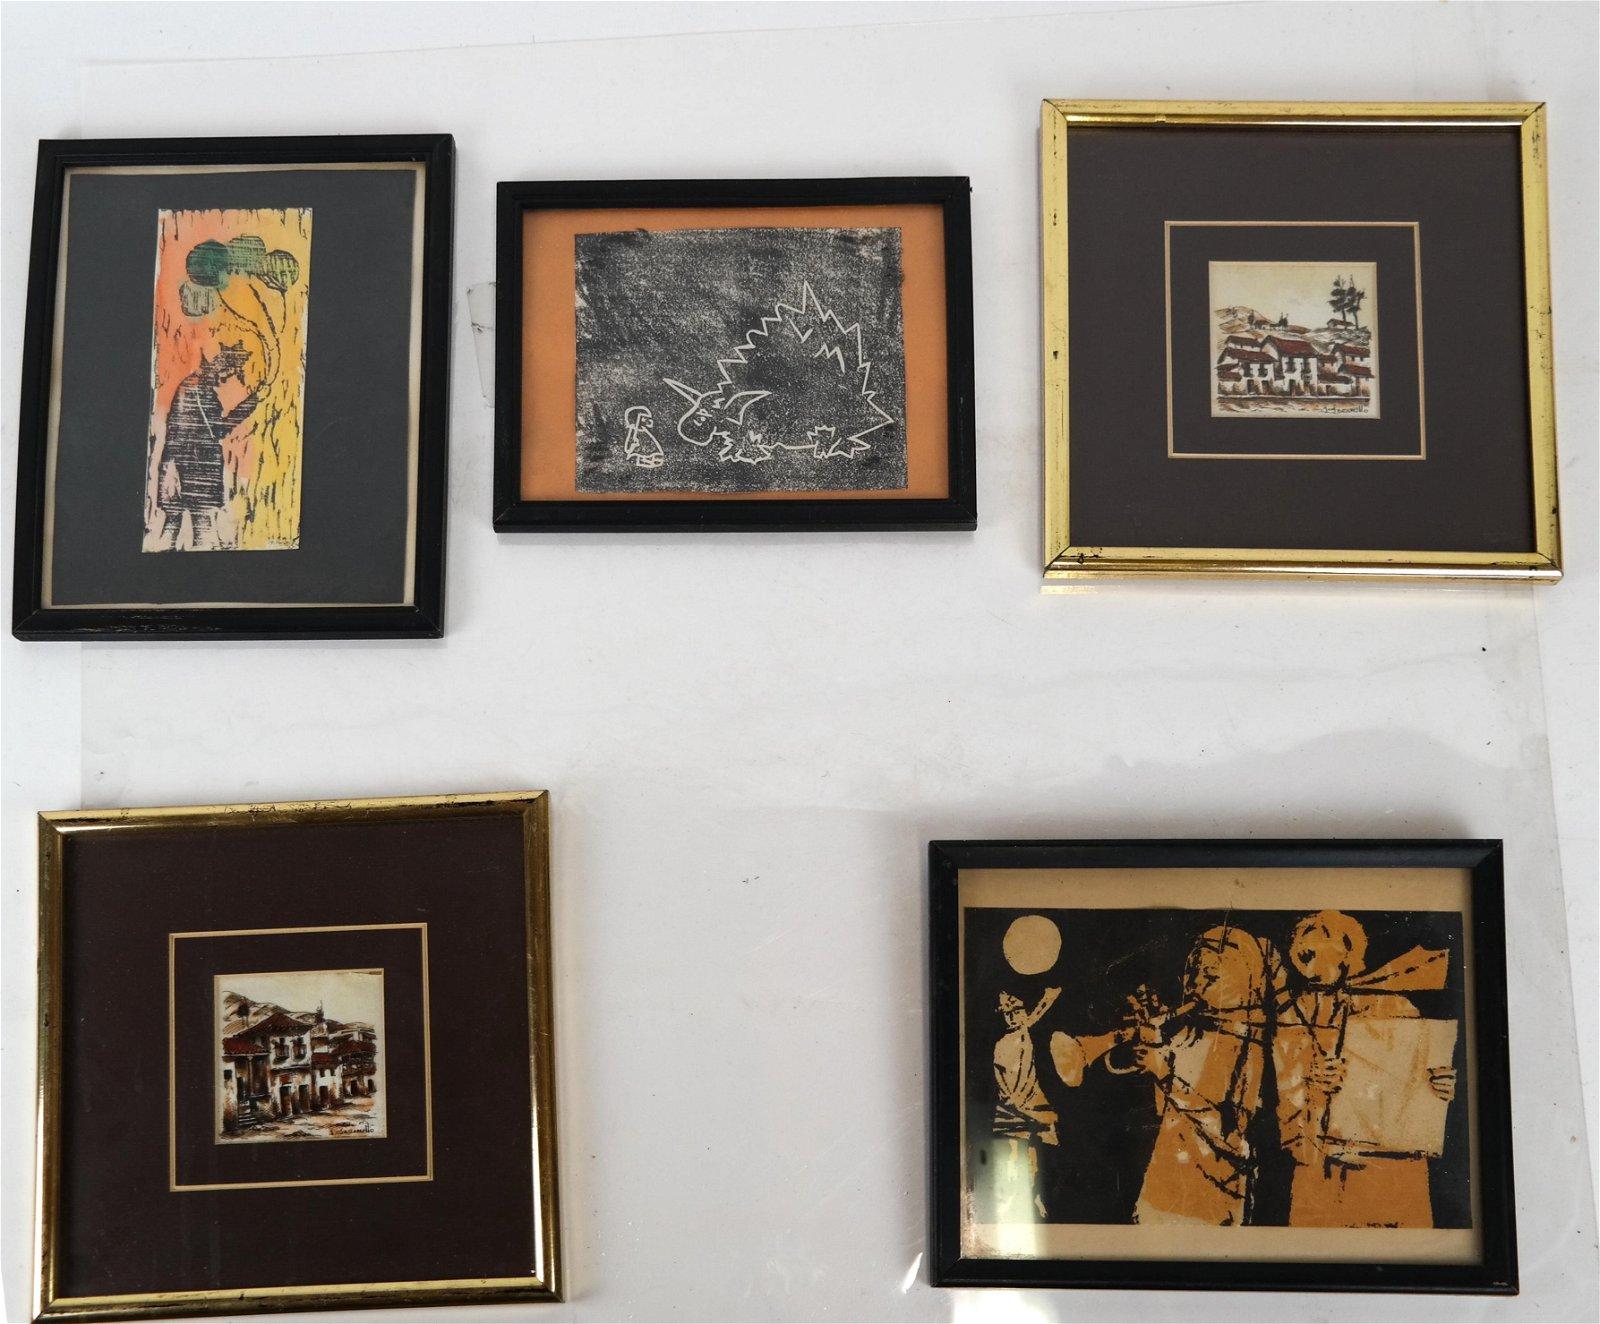 5 Decorative Prints